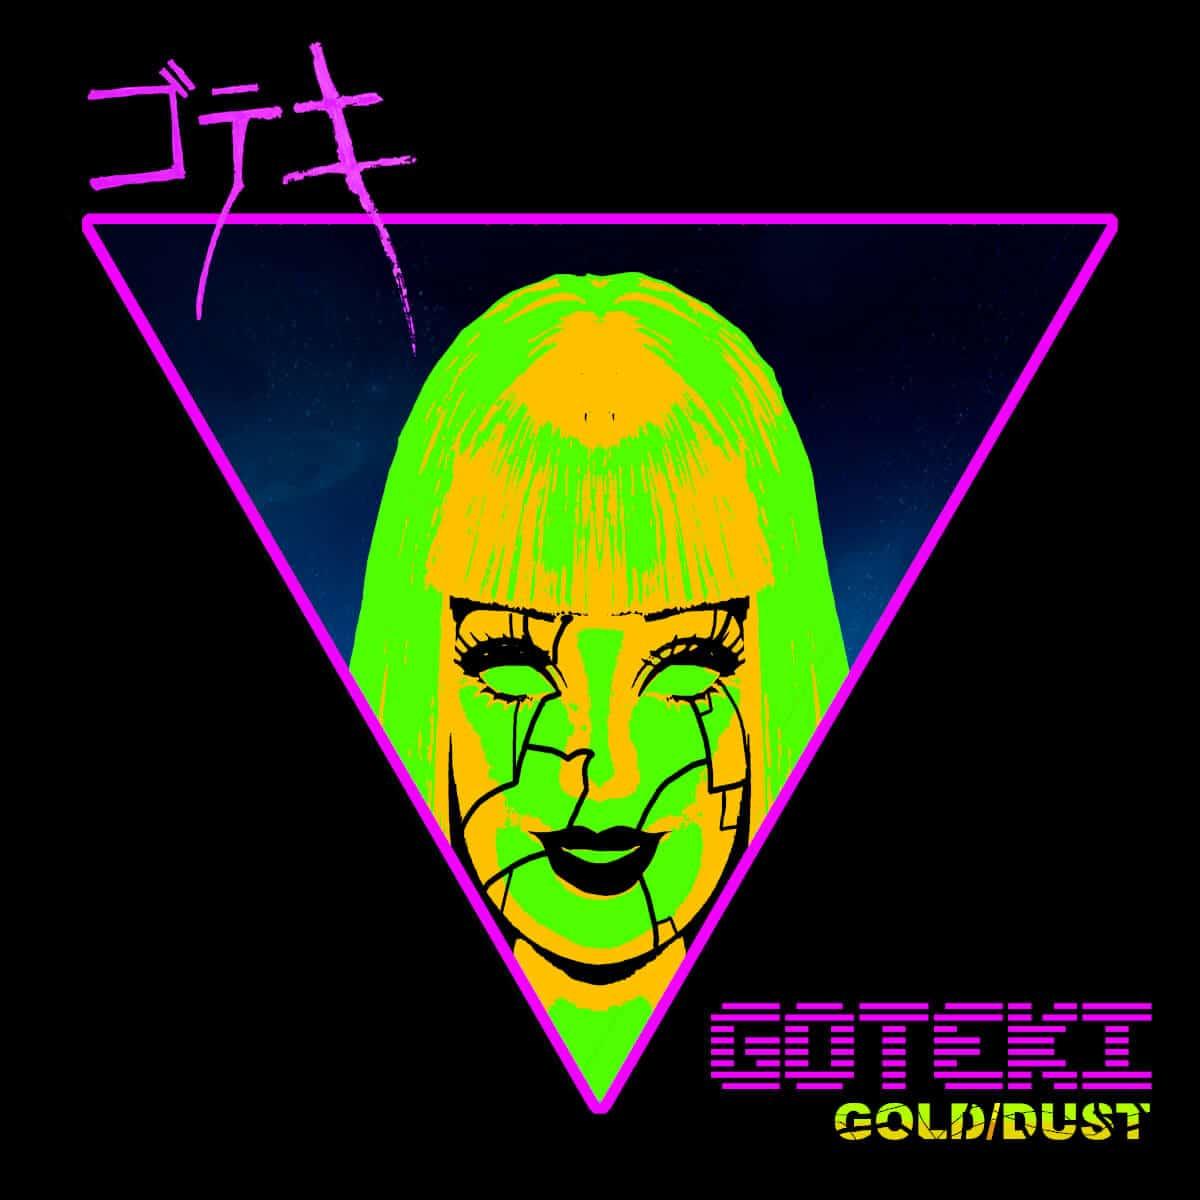 Goteki – Gold/dust